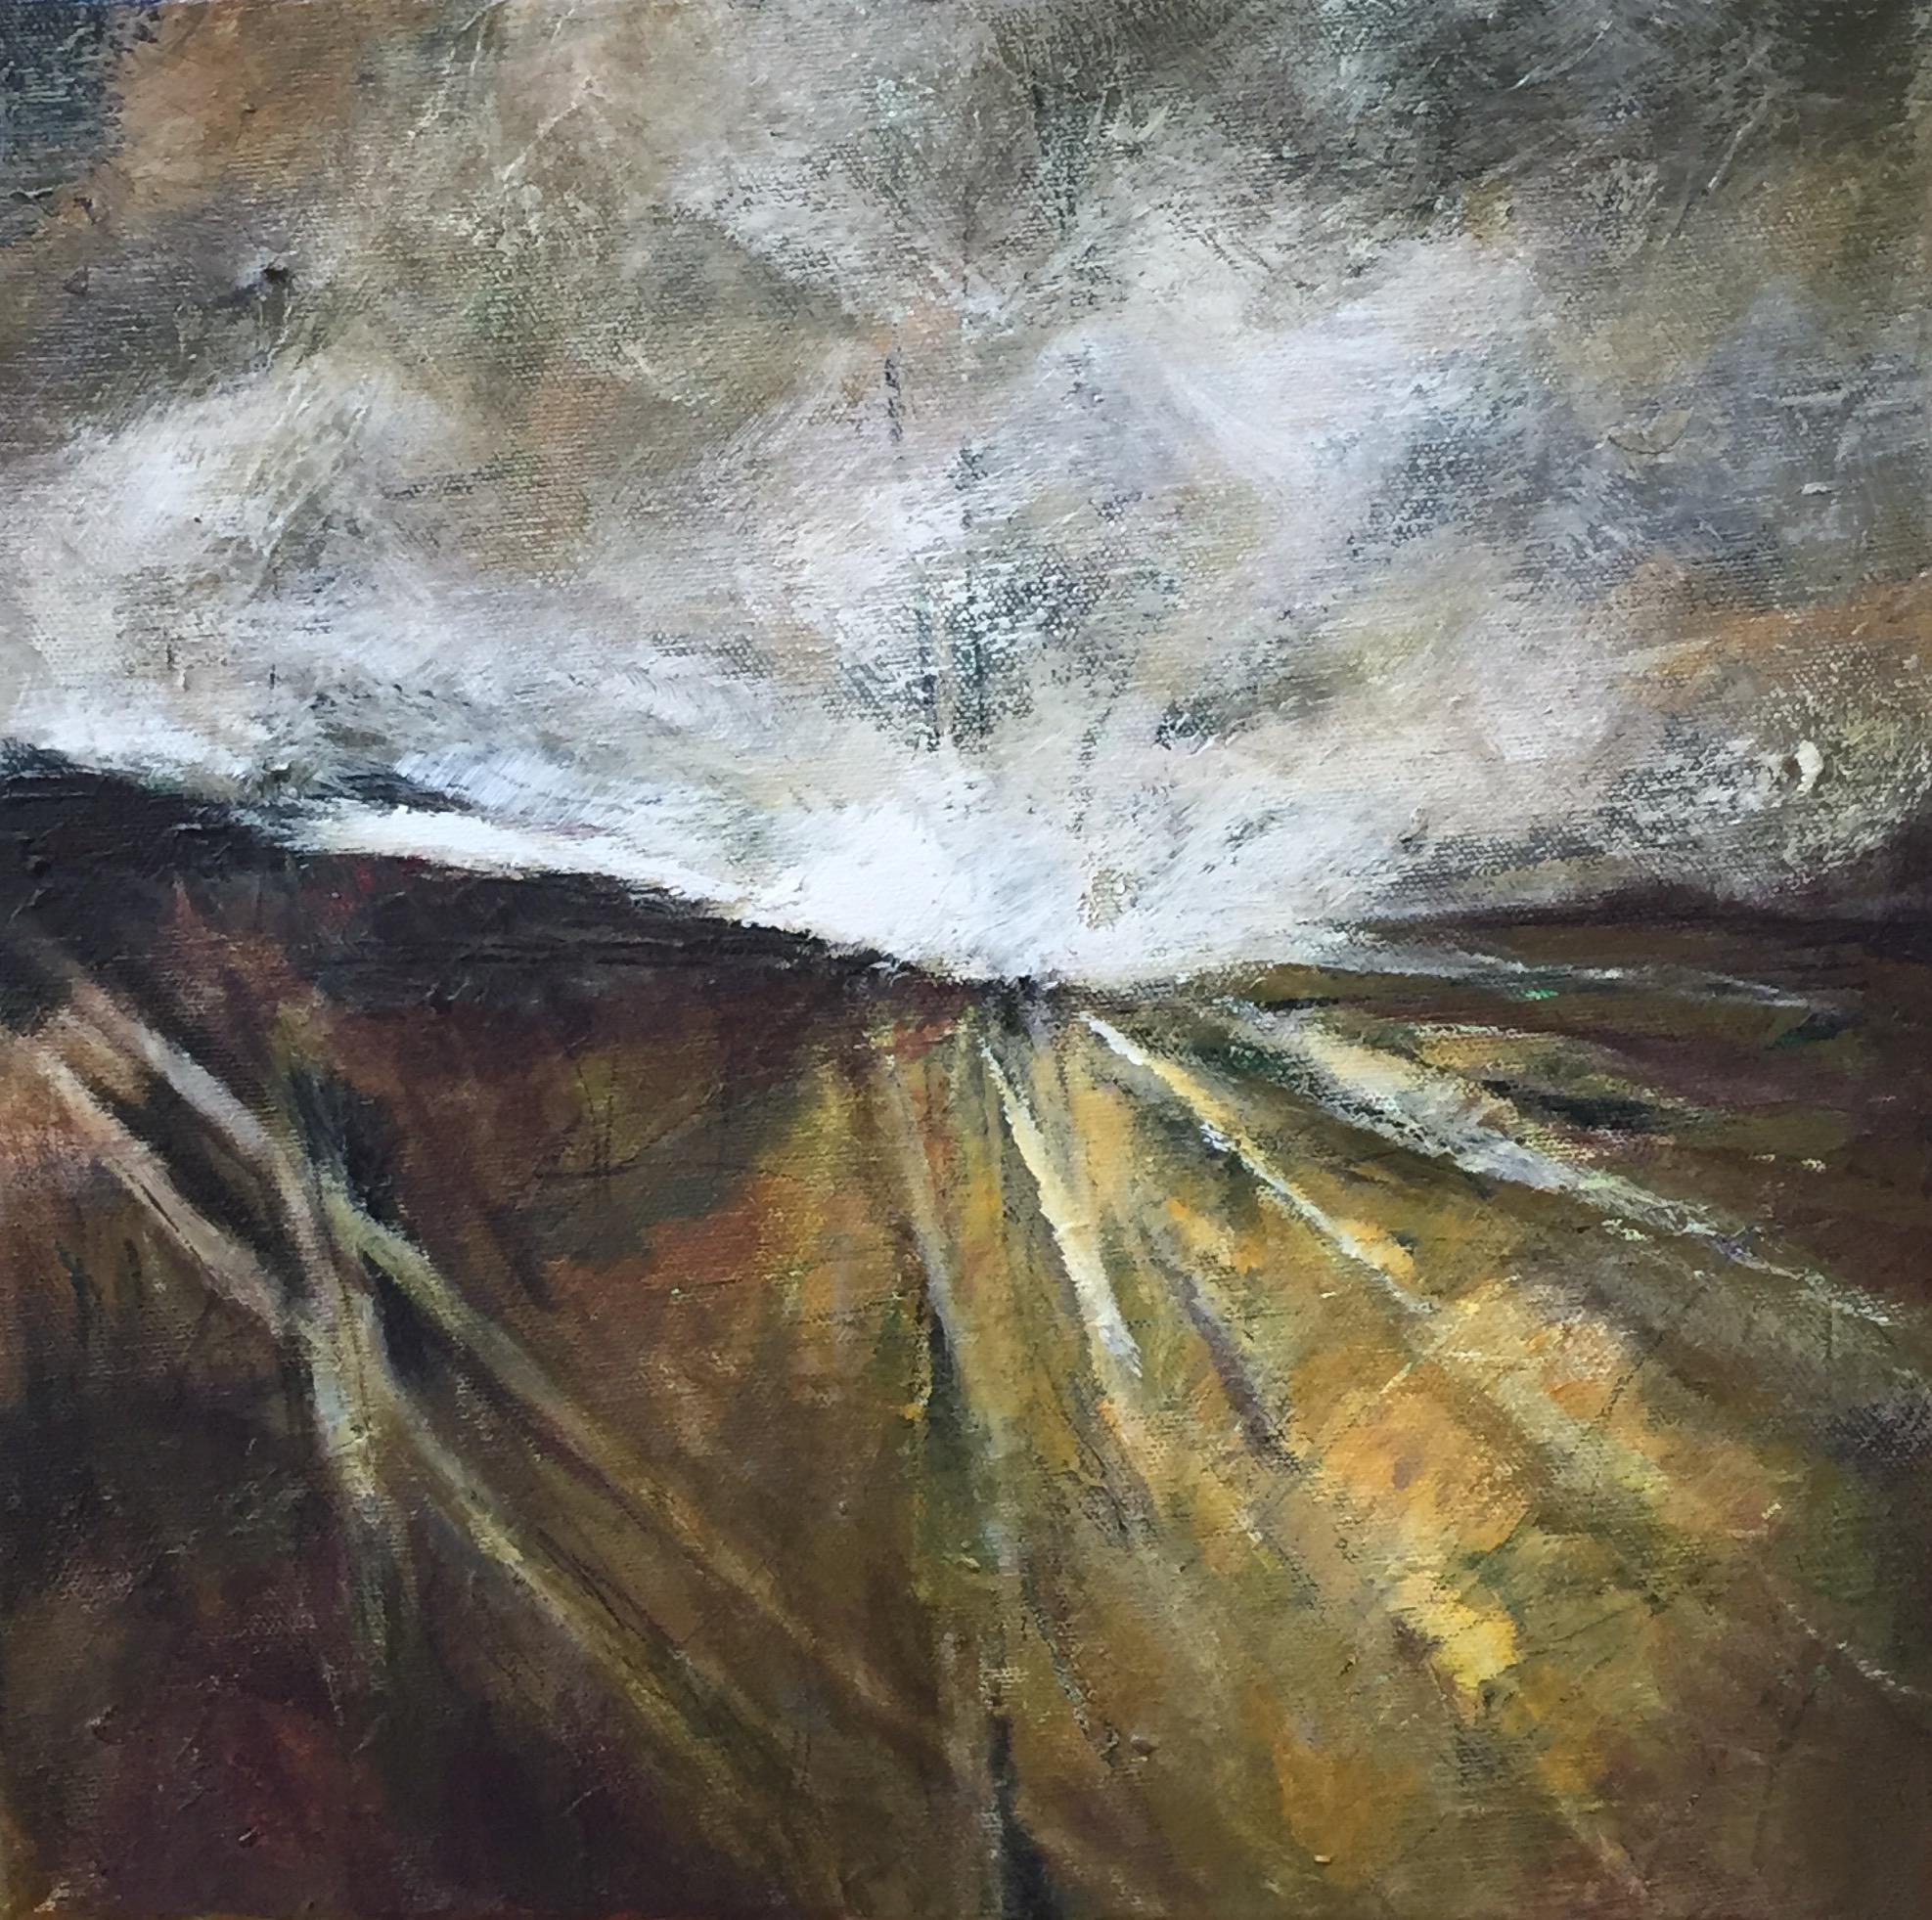 Mole Valley - acrylic on canvas  30x30cm £100